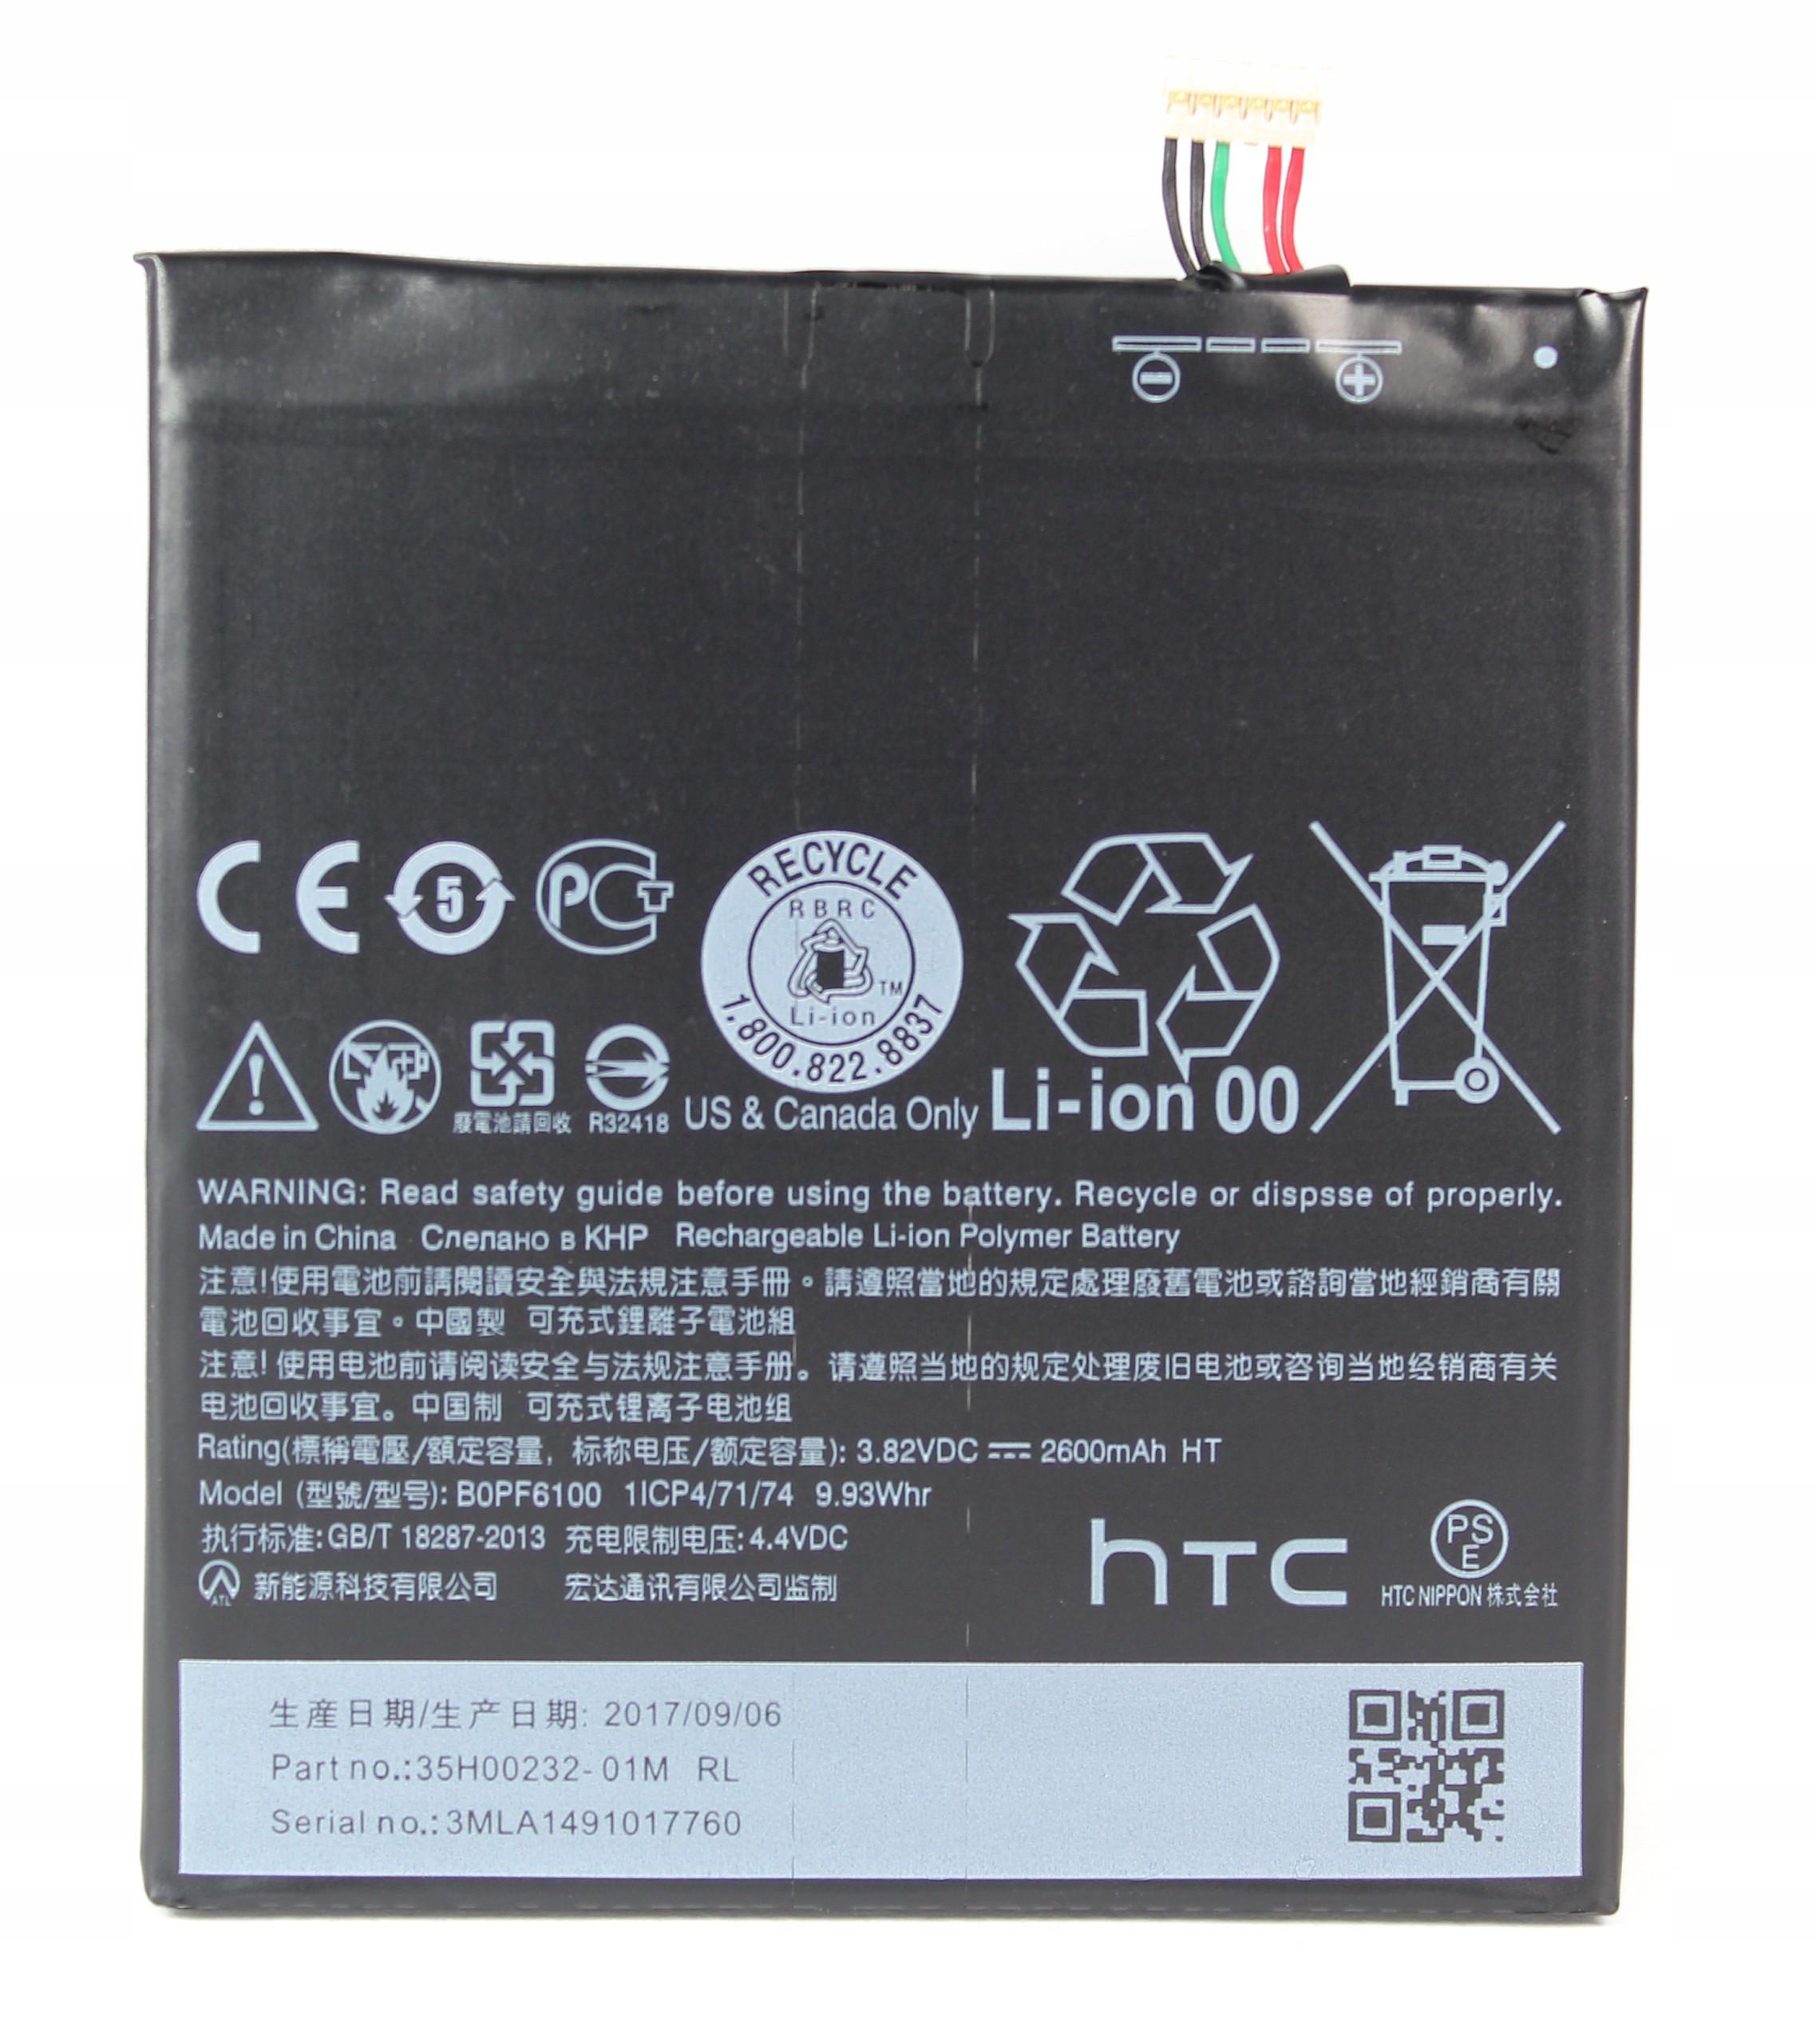 Oryginalna Bateria B0PF6100 Htc Desire 820 2017ROK